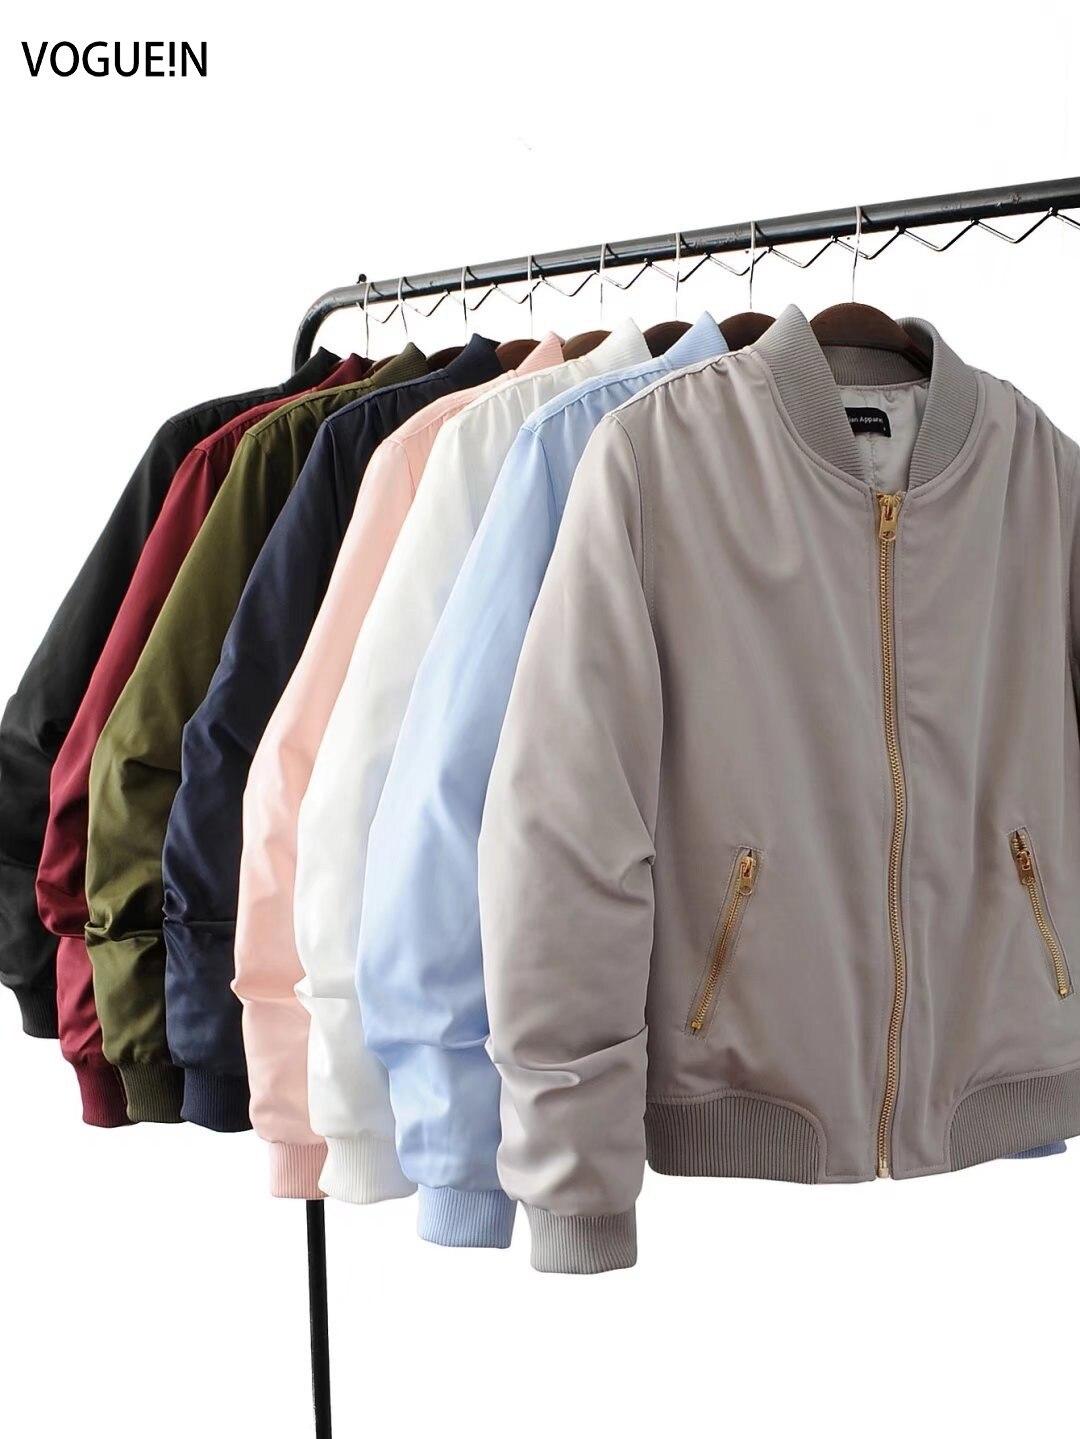 VOGUE!N New Womens Pockets Solid 8 Colors Golden Zip Up Satin Bomber Flight Jacket Coat